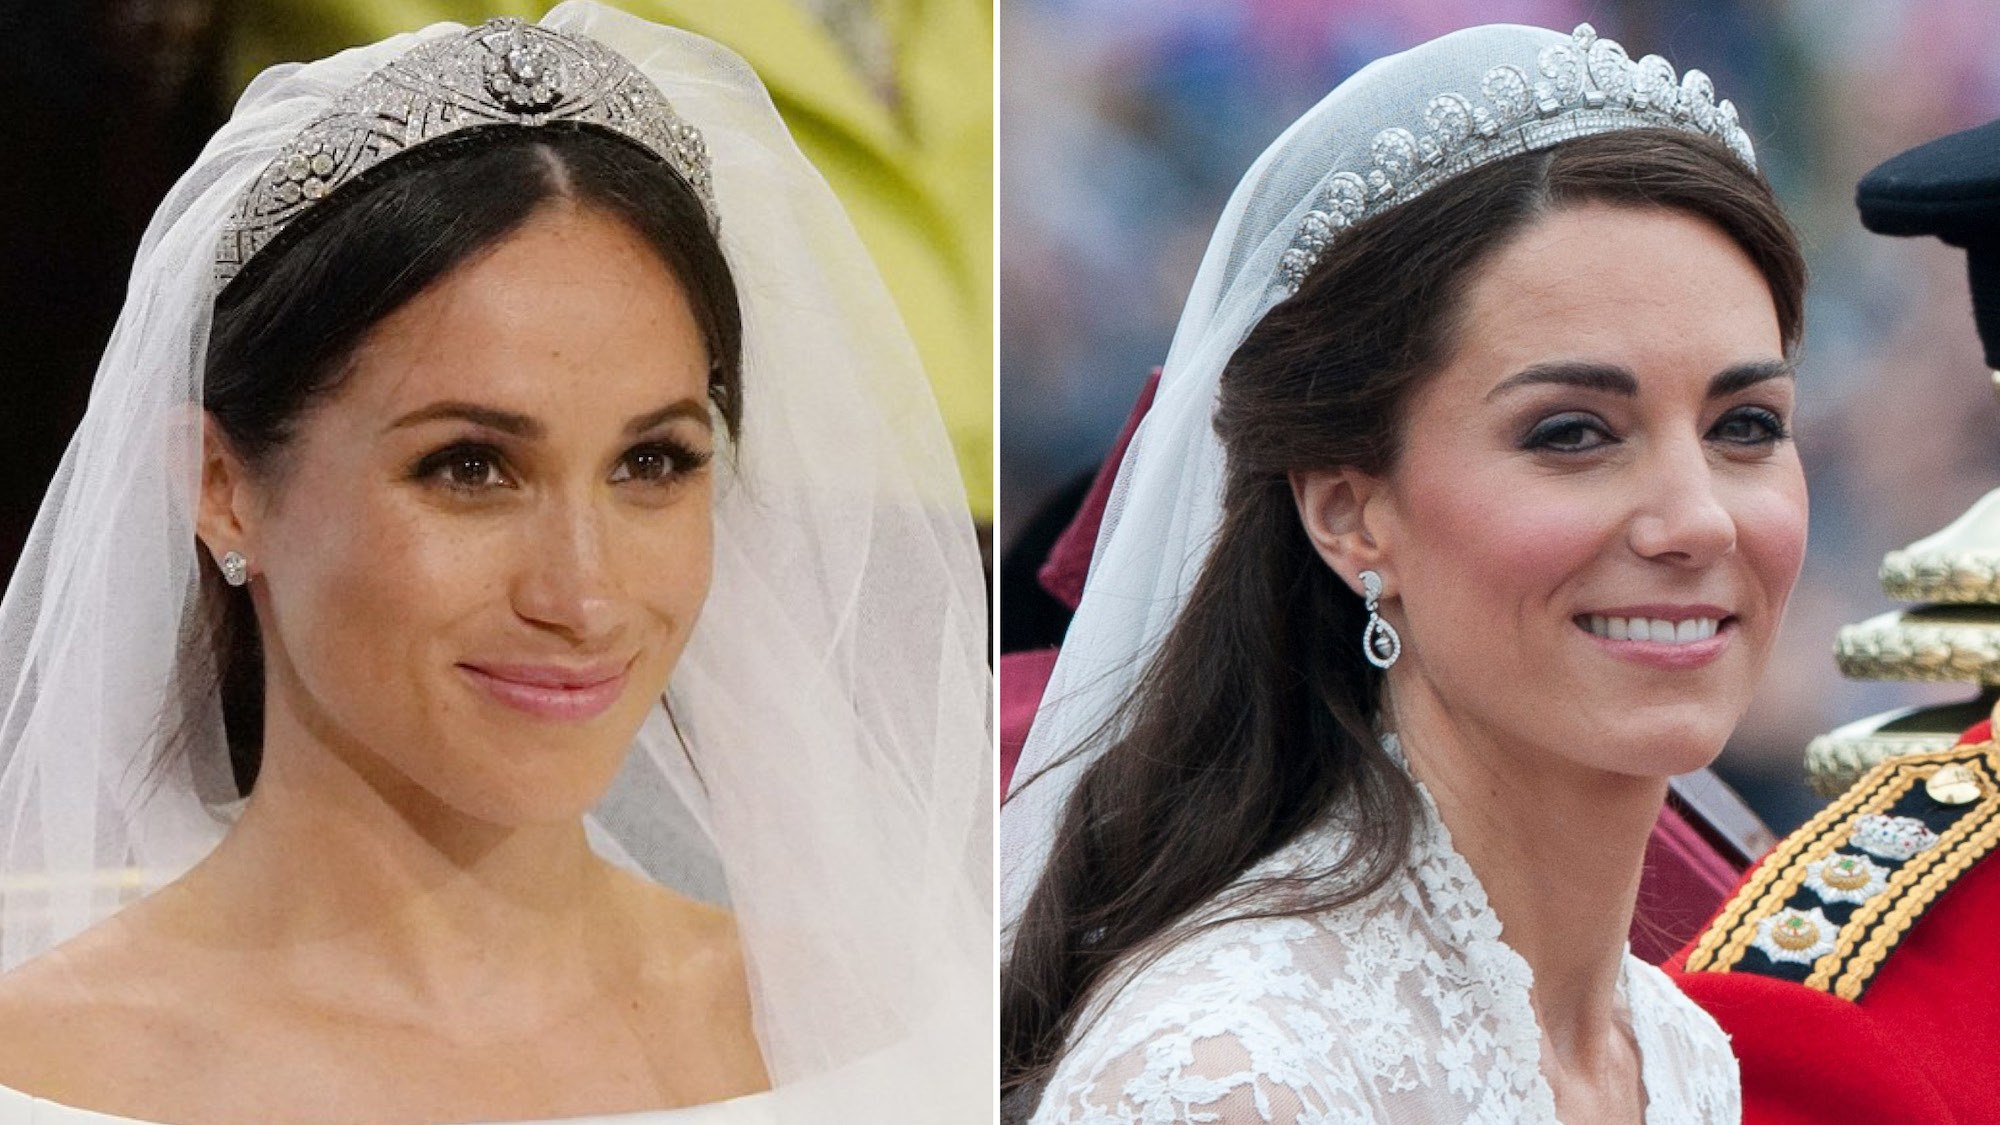 Wedding Makeup Advises From Royal Family Make Up Artist